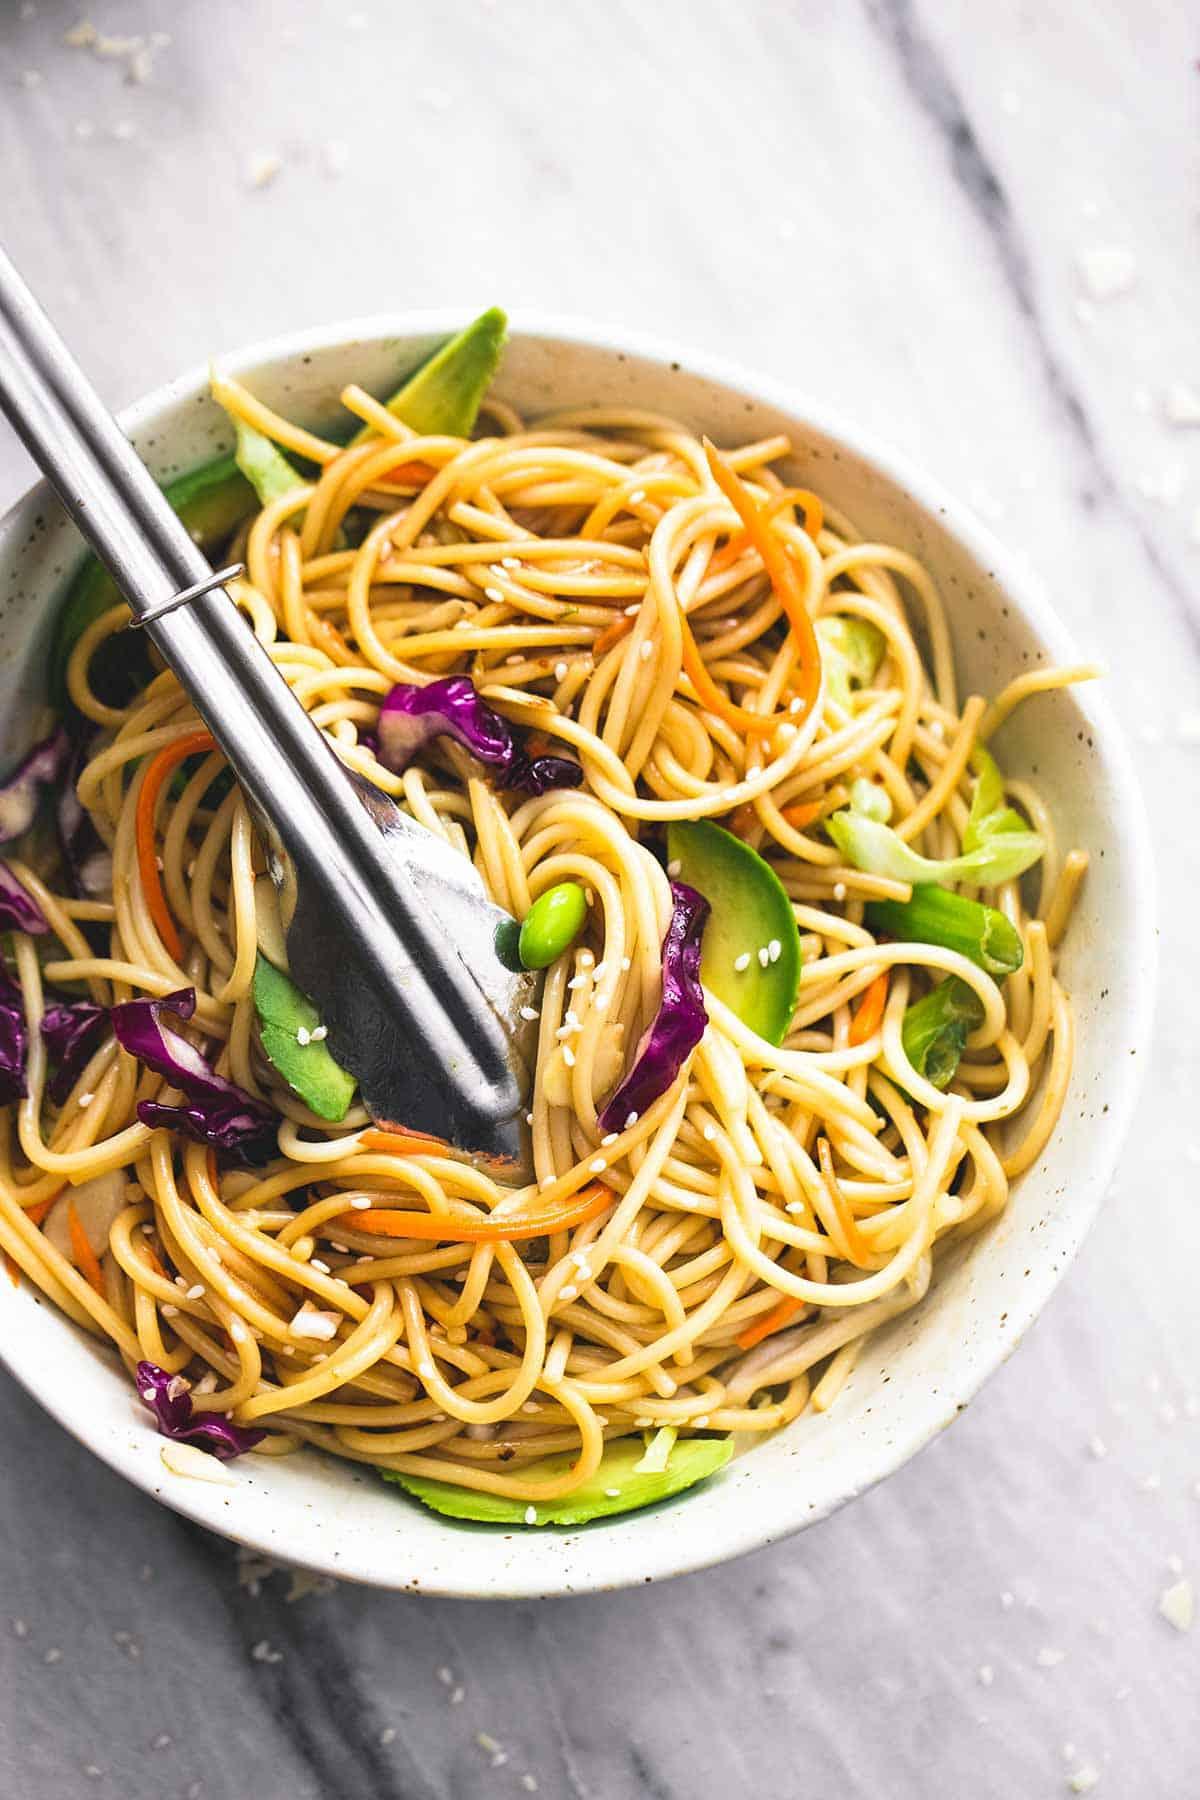 Asian Spaghetti Salad with Sesame Ginger Dressing | lecremedelacrumb.com